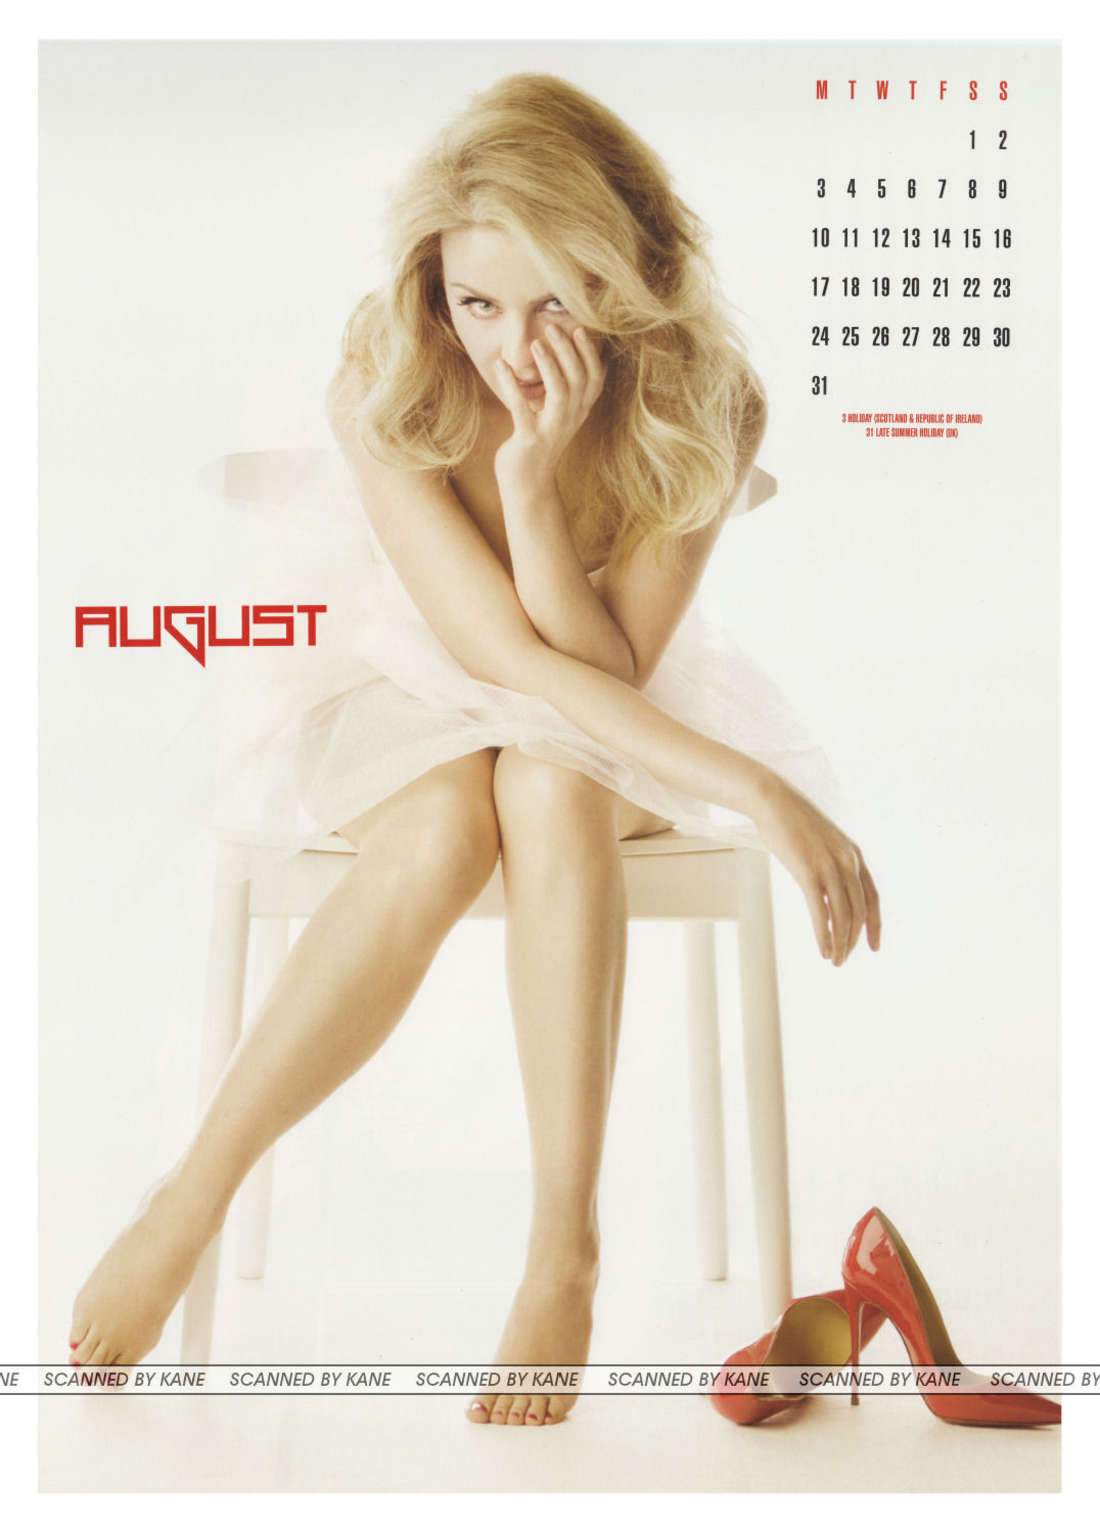 Calendar Photography 2015 : Kylie minogue official calendar gotceleb